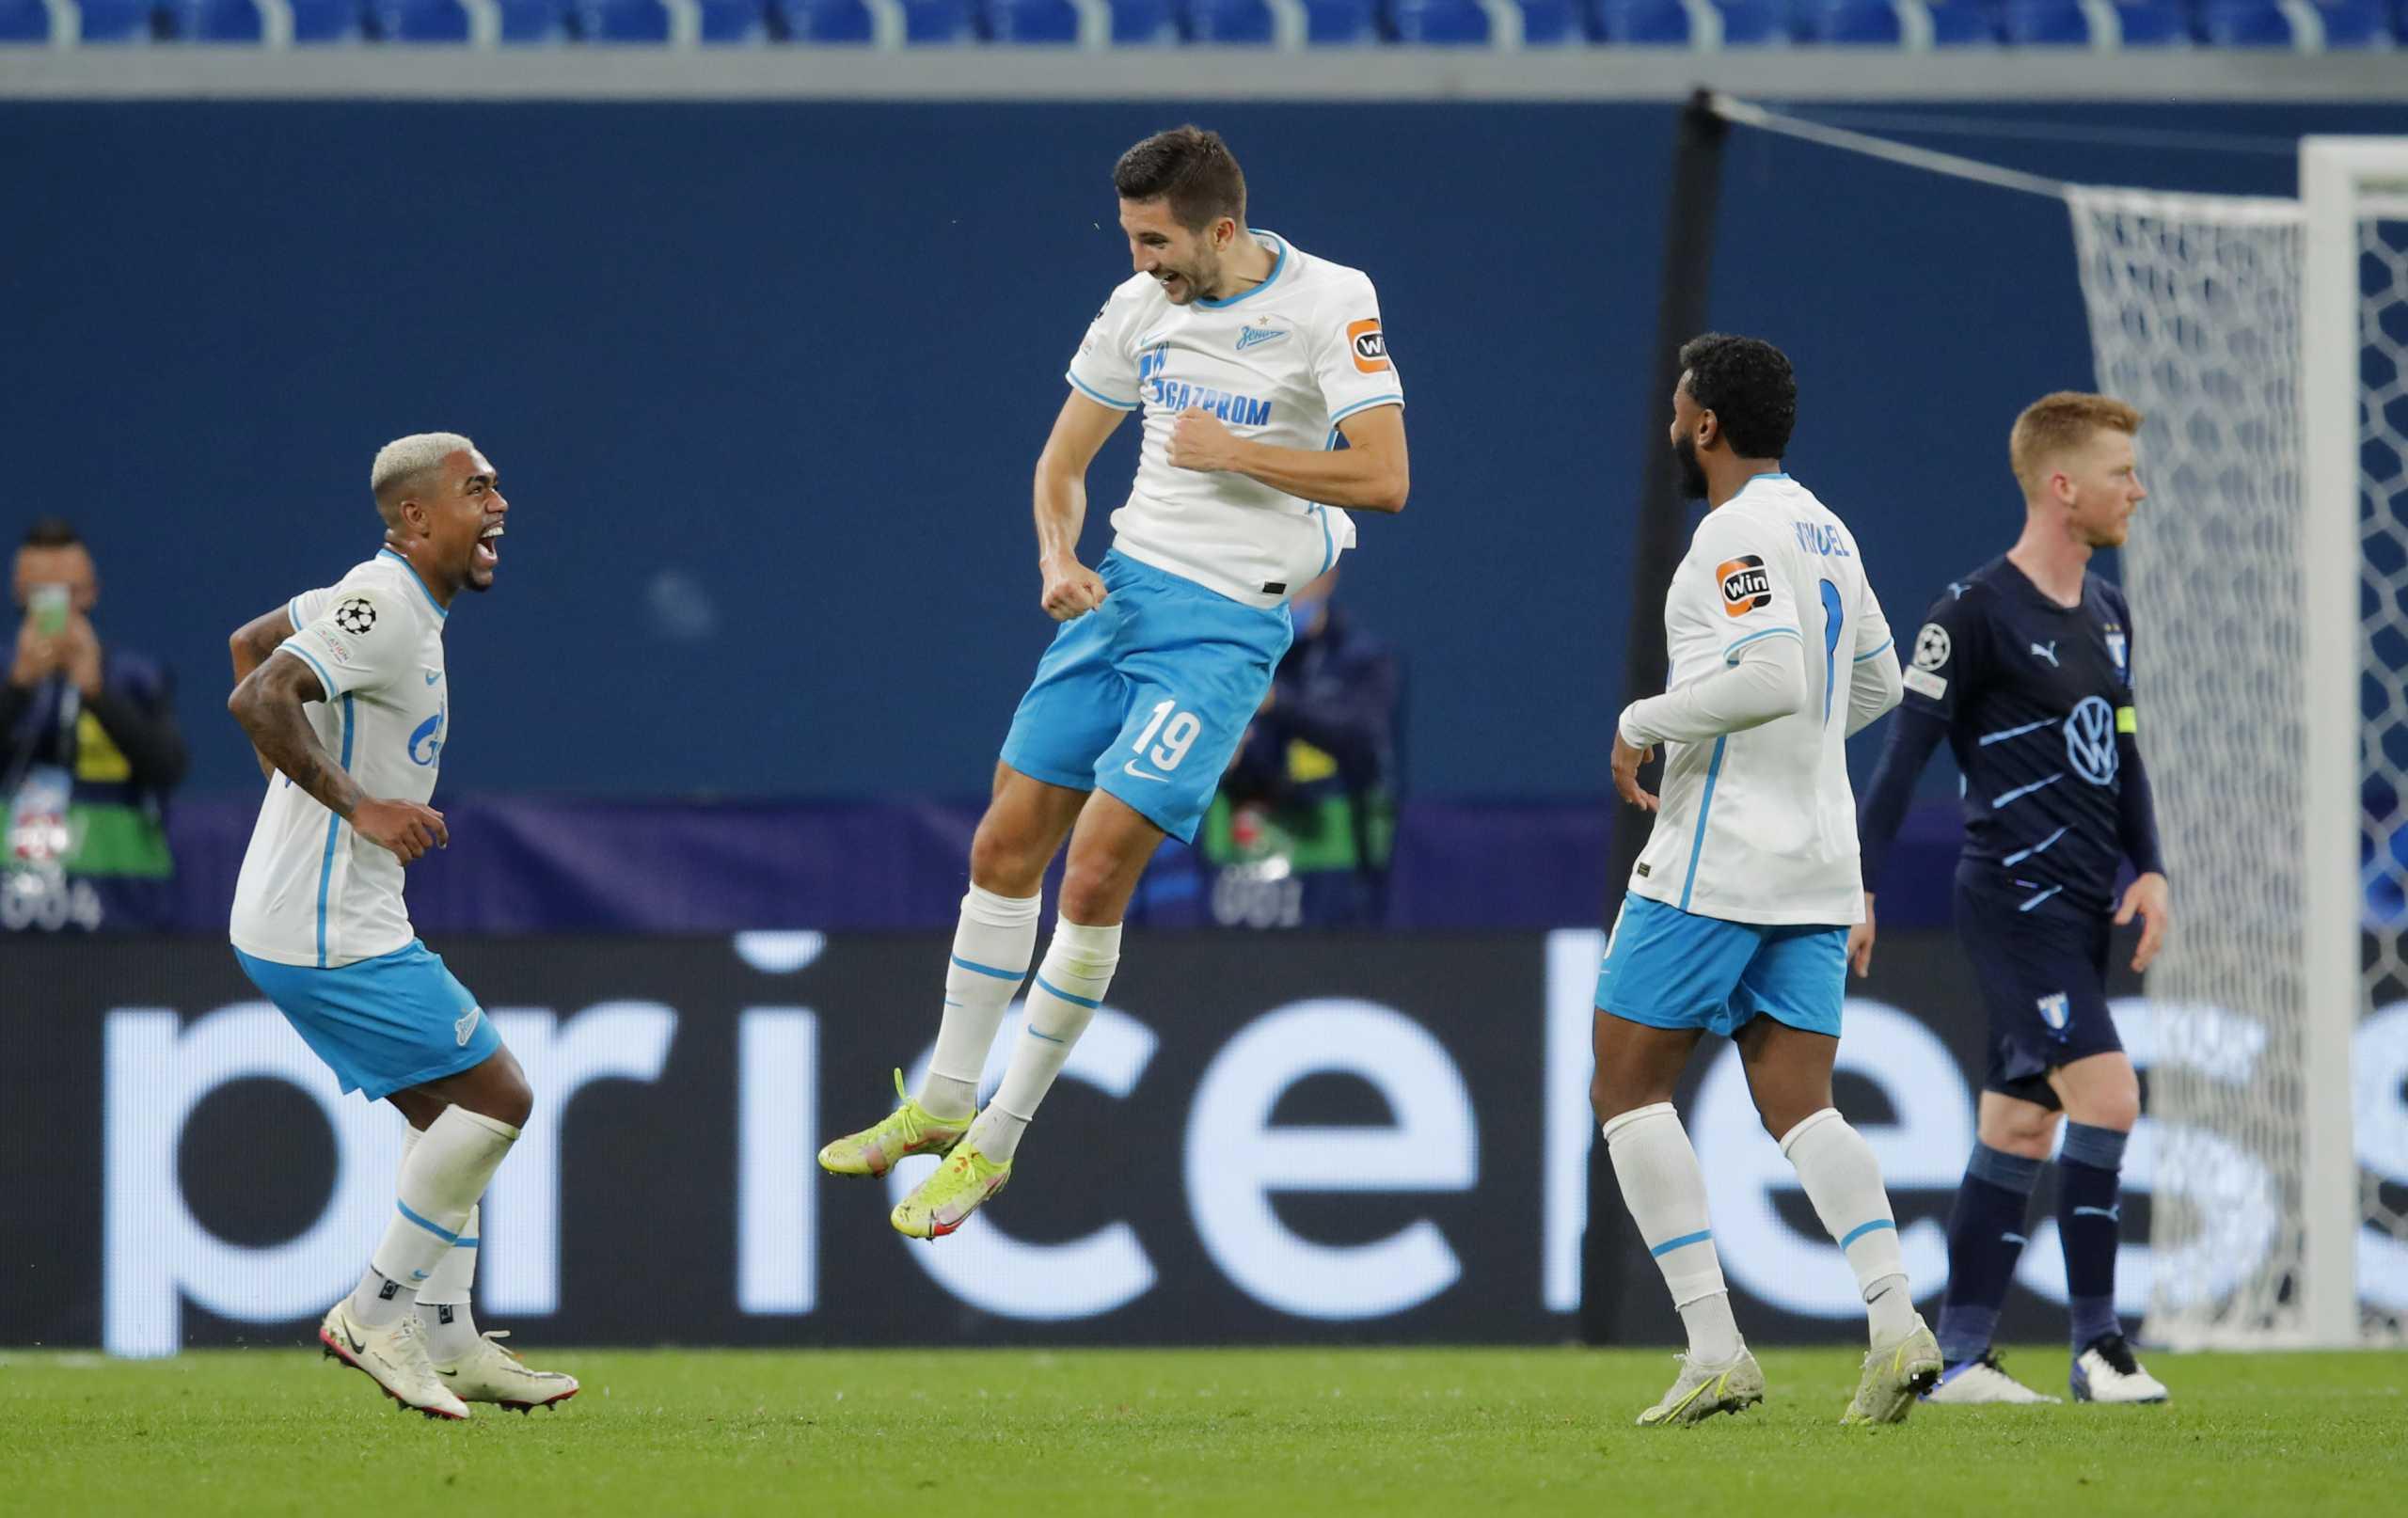 Champions League, Ζενίτ – Μάλμε 4-0 και Αταλάντα – Γιουνγκ Μπόις 1-0: «Μίλησαν» οι έδρες